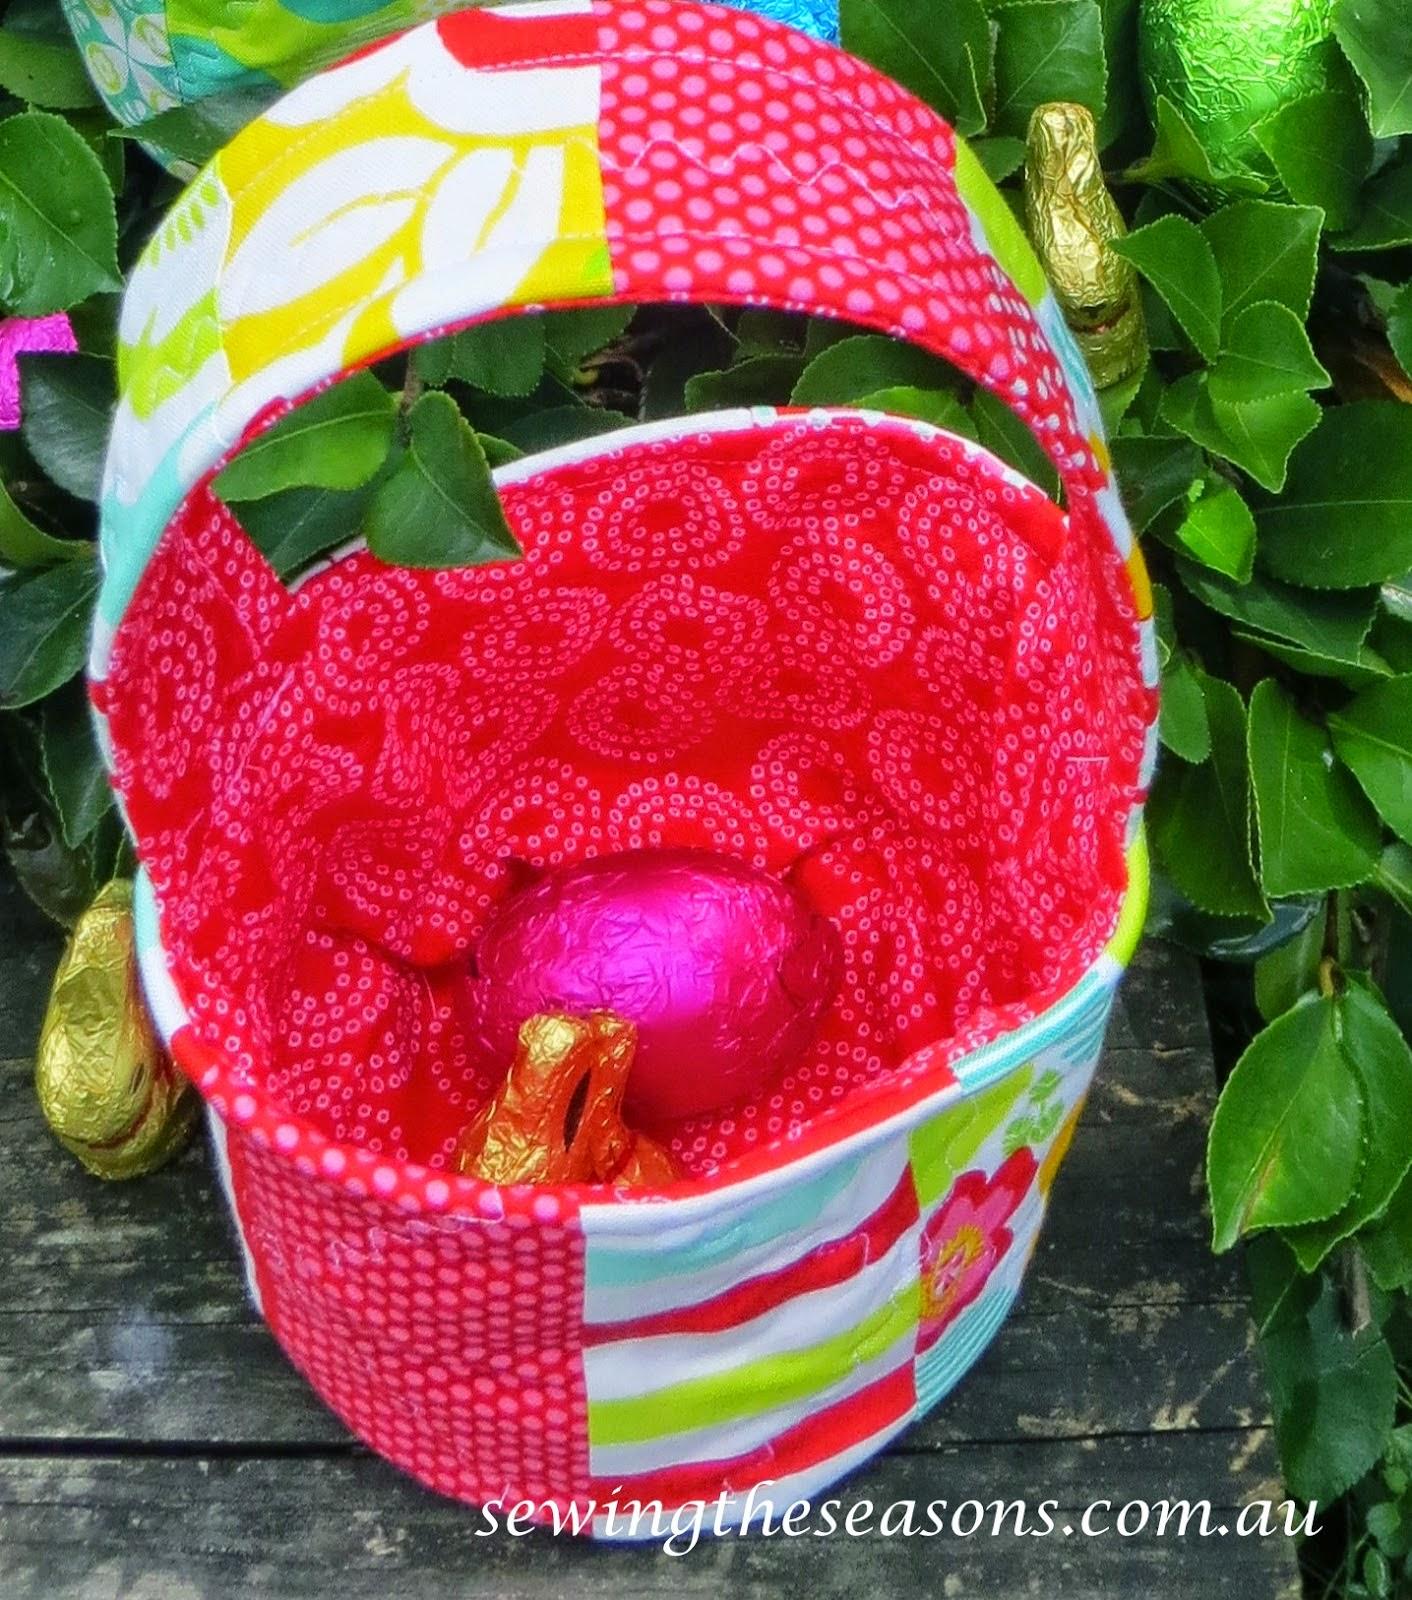 http://www.sewingtheseasons.com.au/2015/03/hippity-hoppity-easters-on-its-way.html